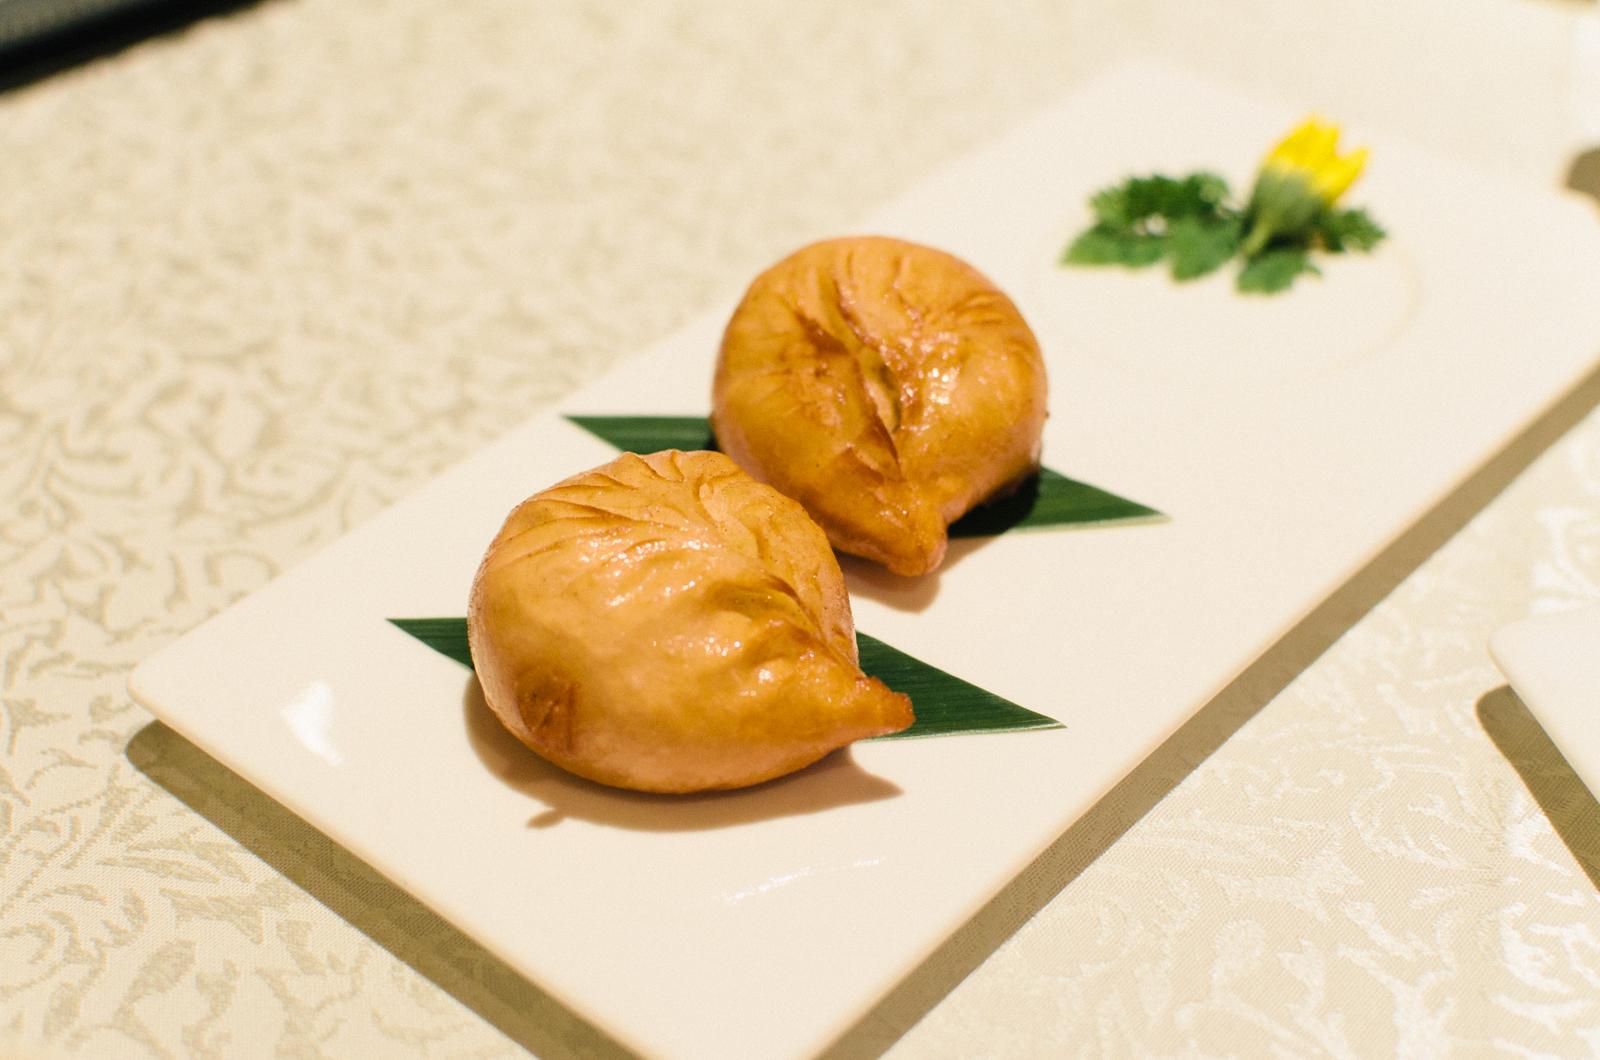 Deep-fried Buns with Minced Pork, Dried Shrimps, aubergine and Chilli (脆皮玉茄包)